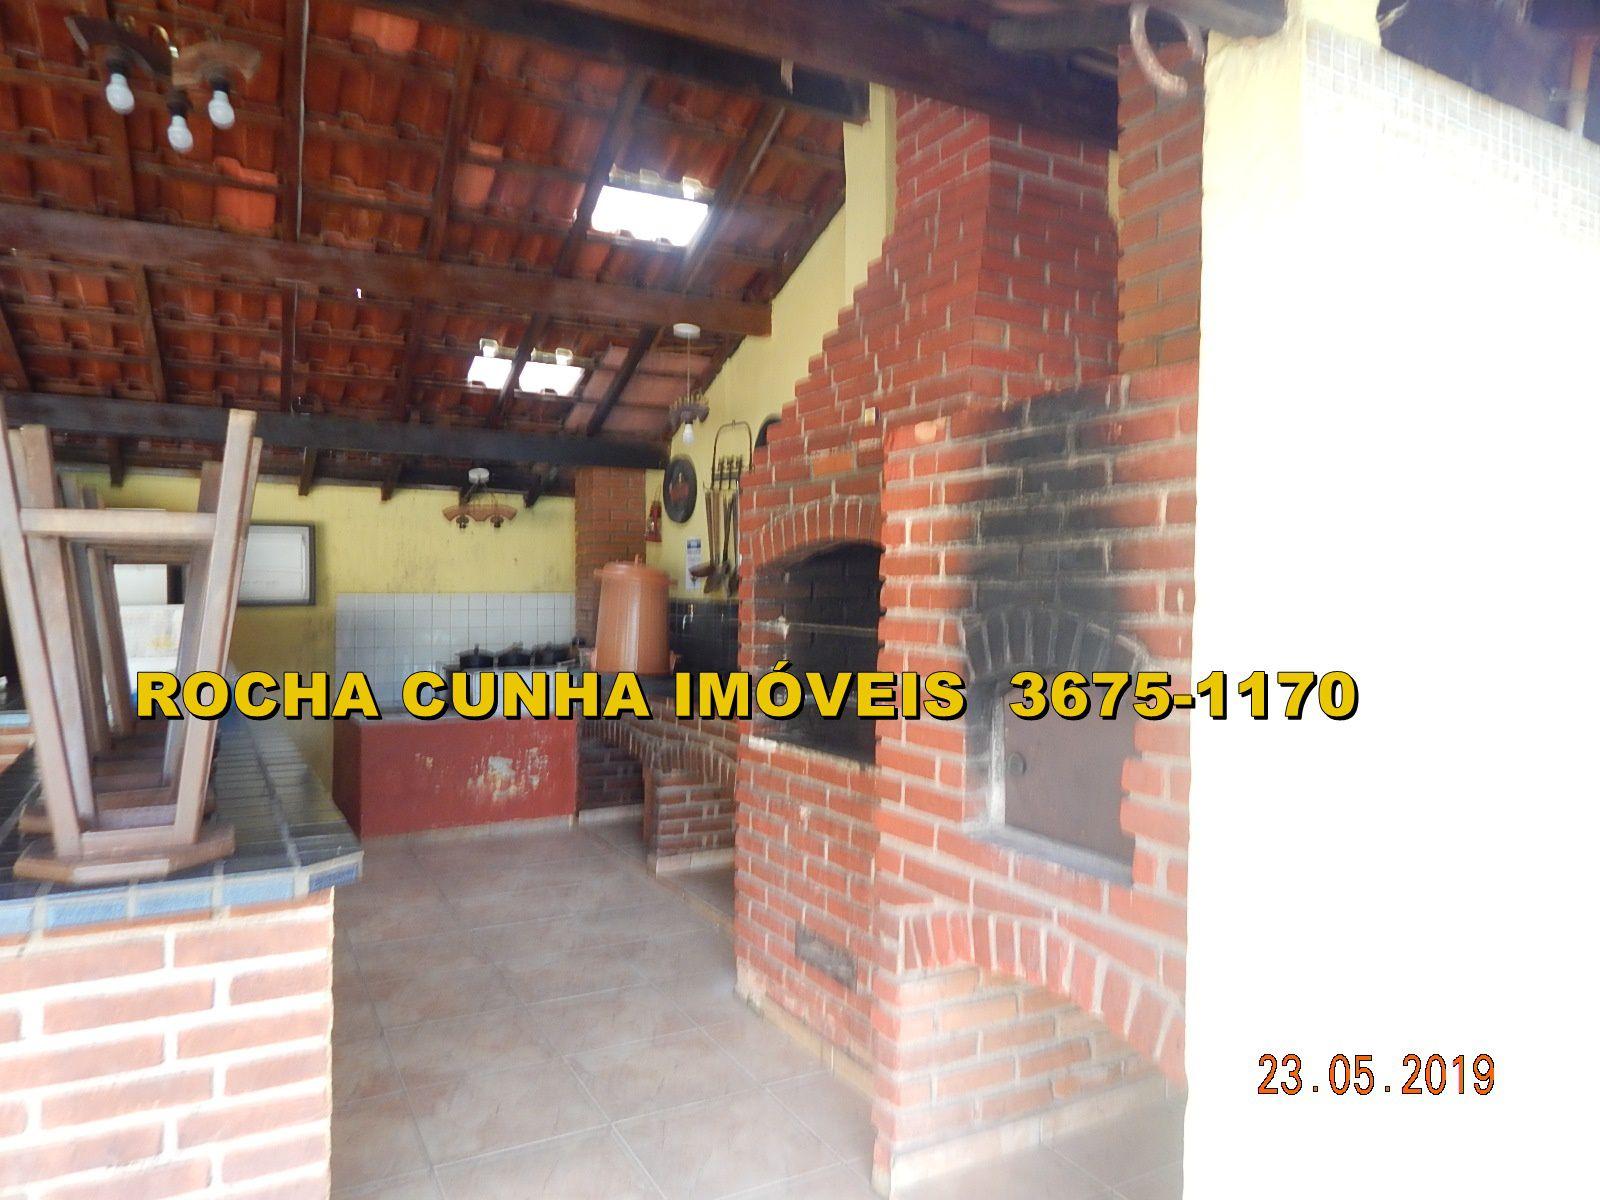 Chácara à venda Santana de Parnaíba,SP - R$ 780.000 - CHACARA0010 - 8